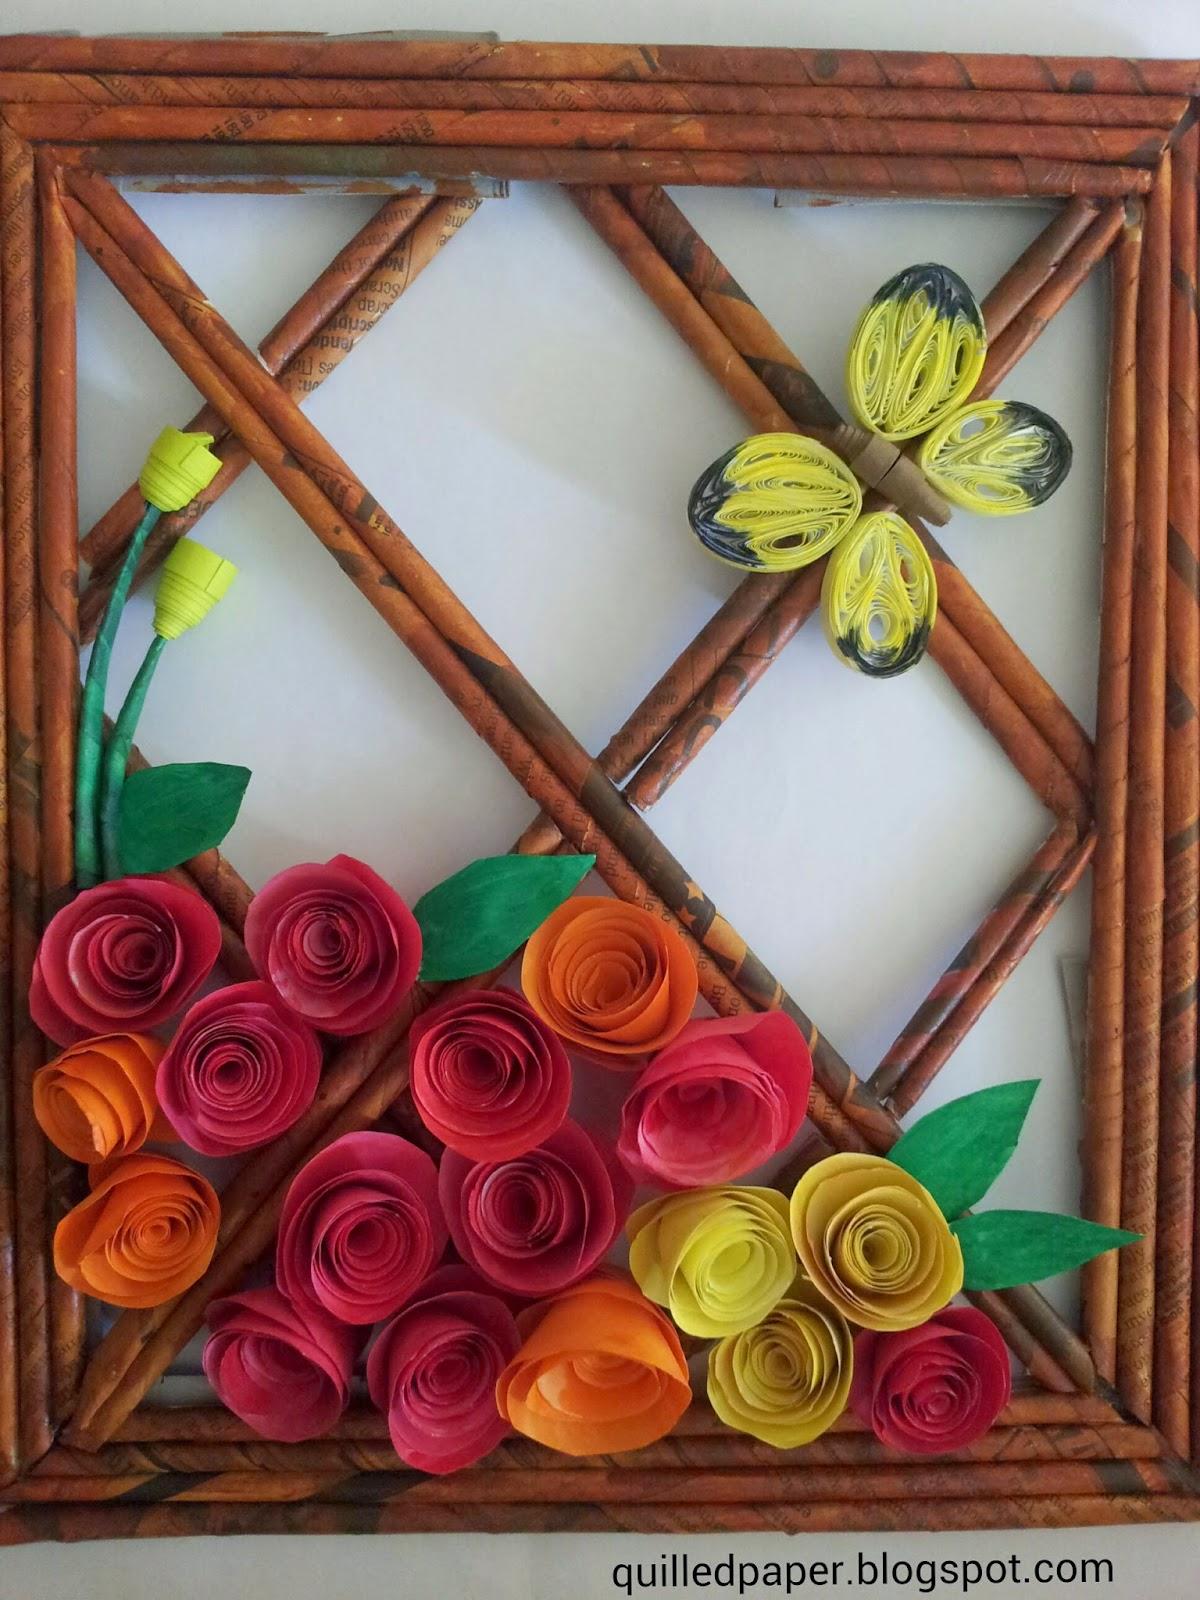 Paper magic: Roses on newspaper frame